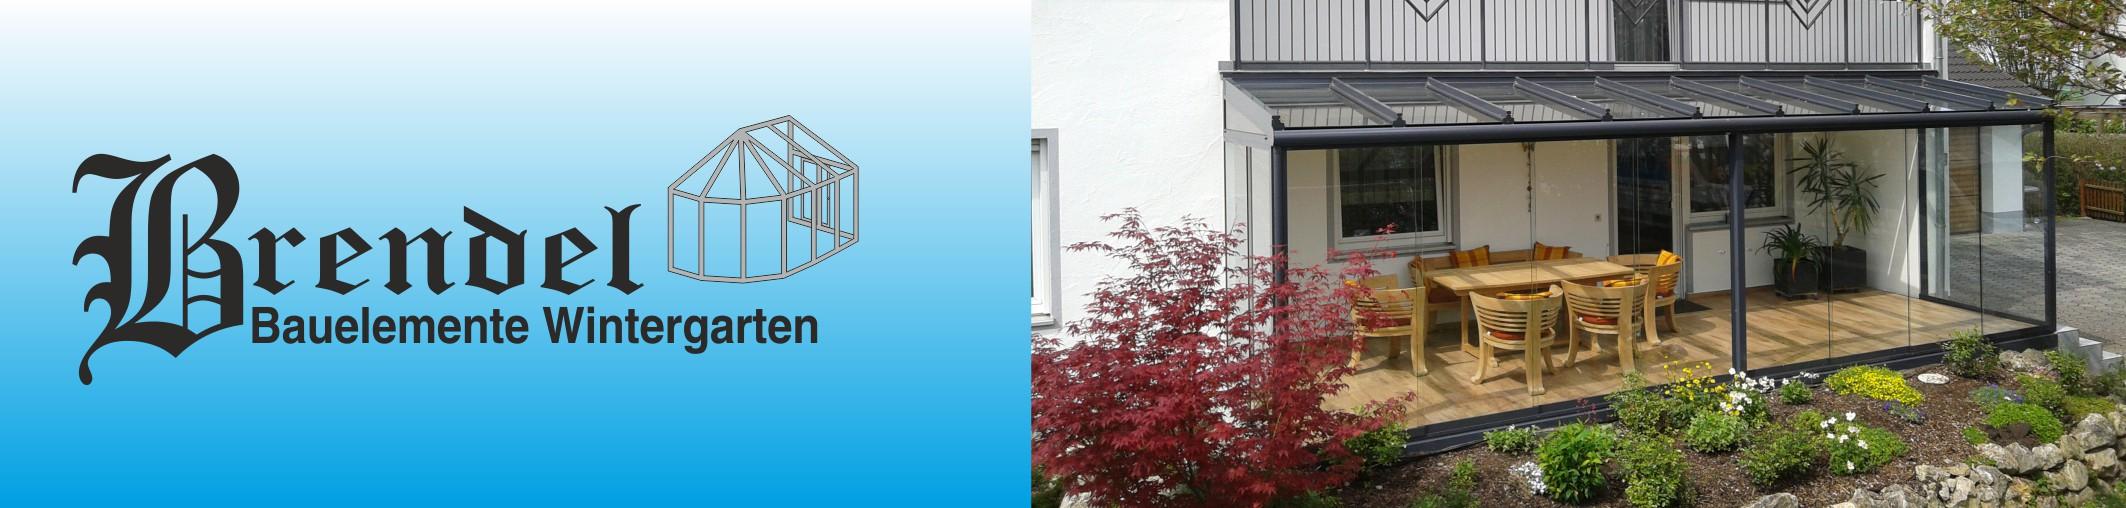 Bauelemente – Wintergarten – BRENDEL